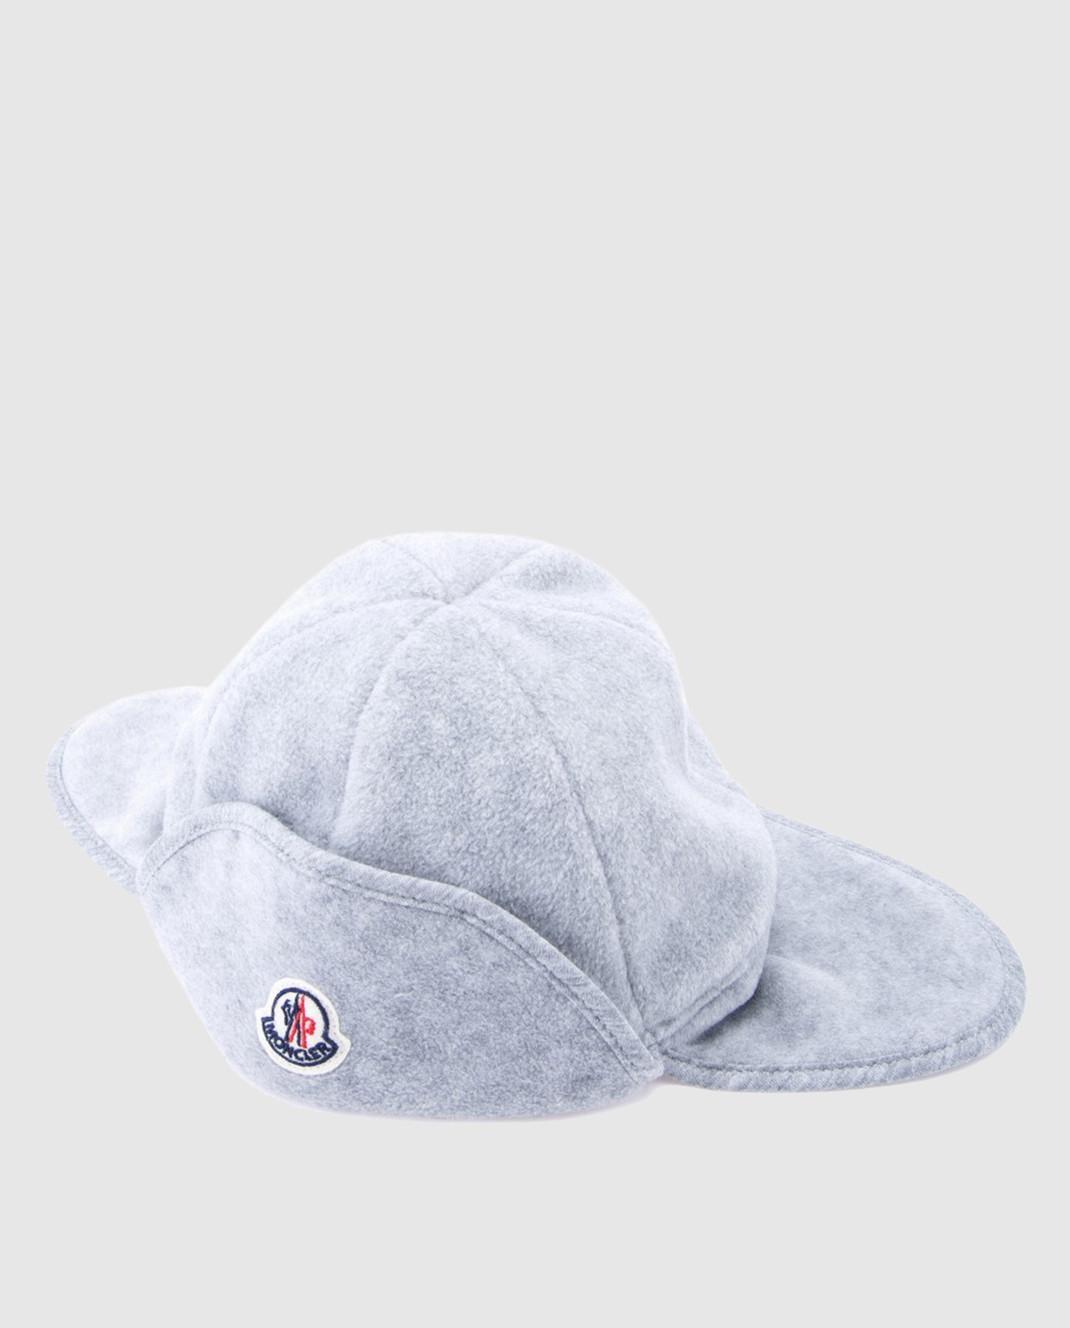 Moncler ENFANT Детская серая шапка 00623